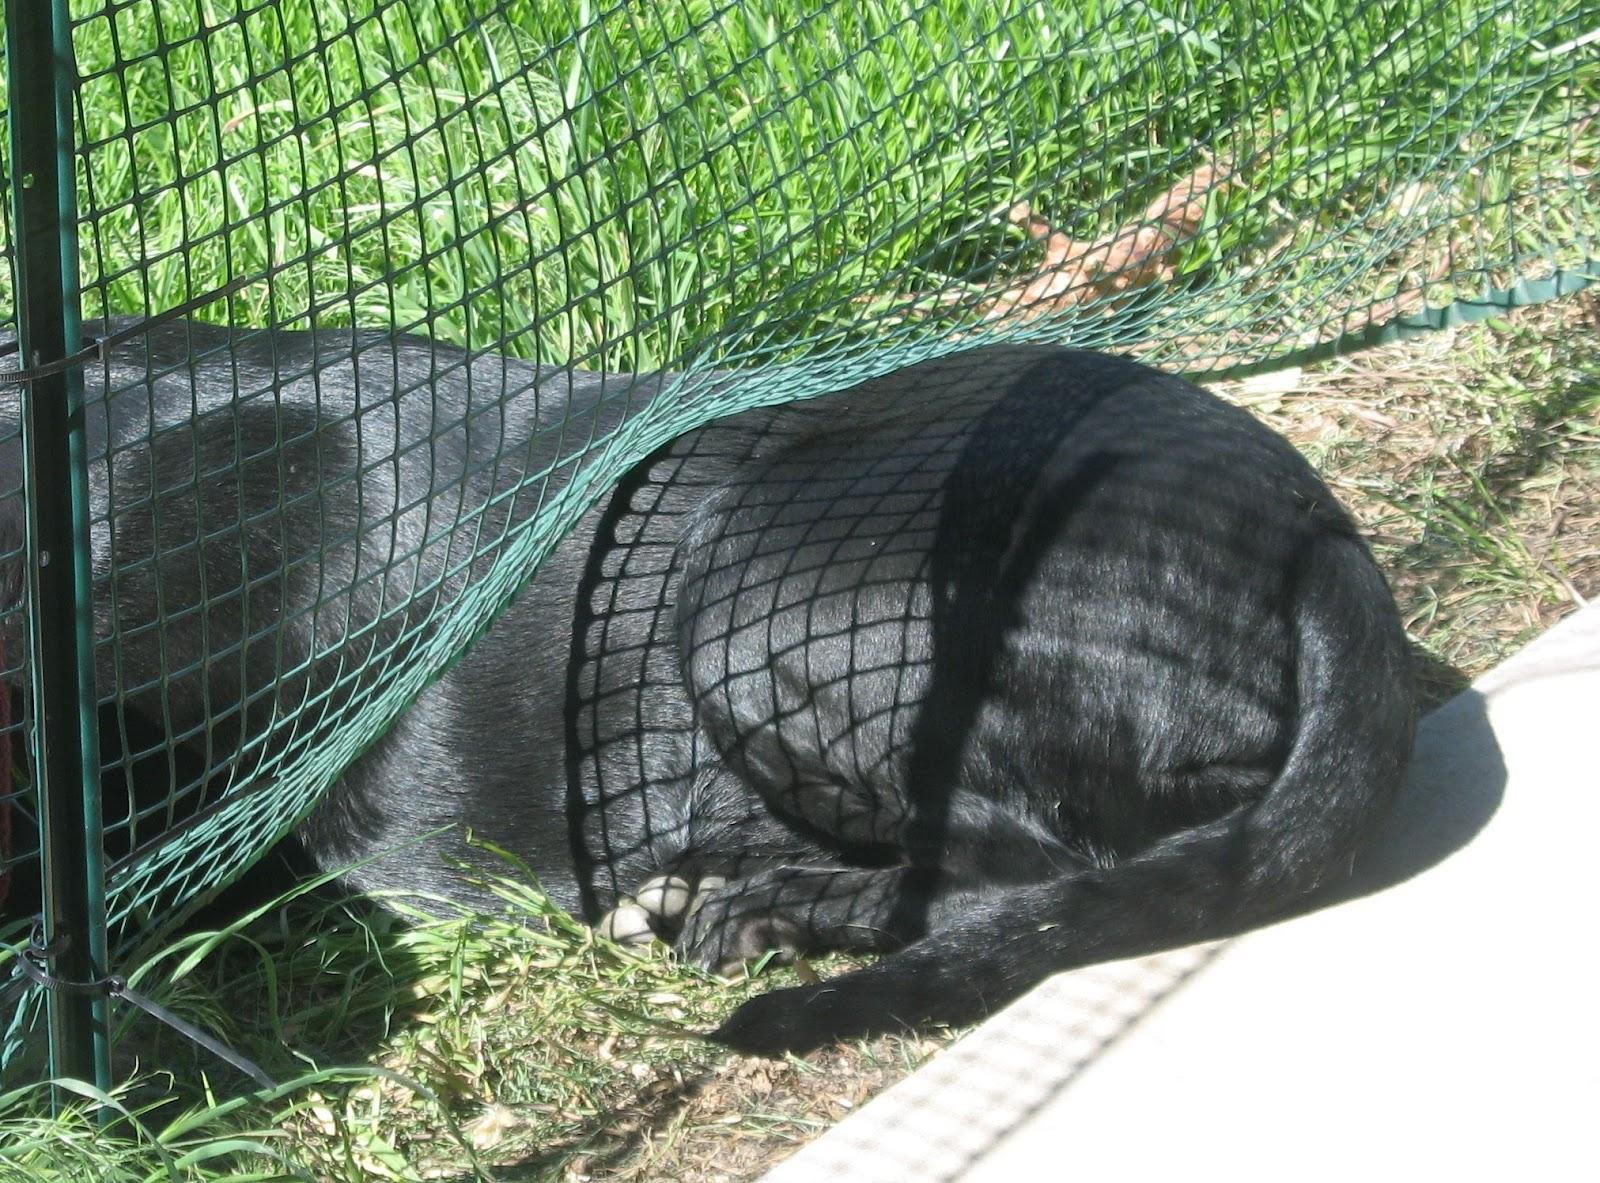 Kitchen Garden Fence The Essary Kitchen Garden Update Dogs Grubs And Beer Oh My